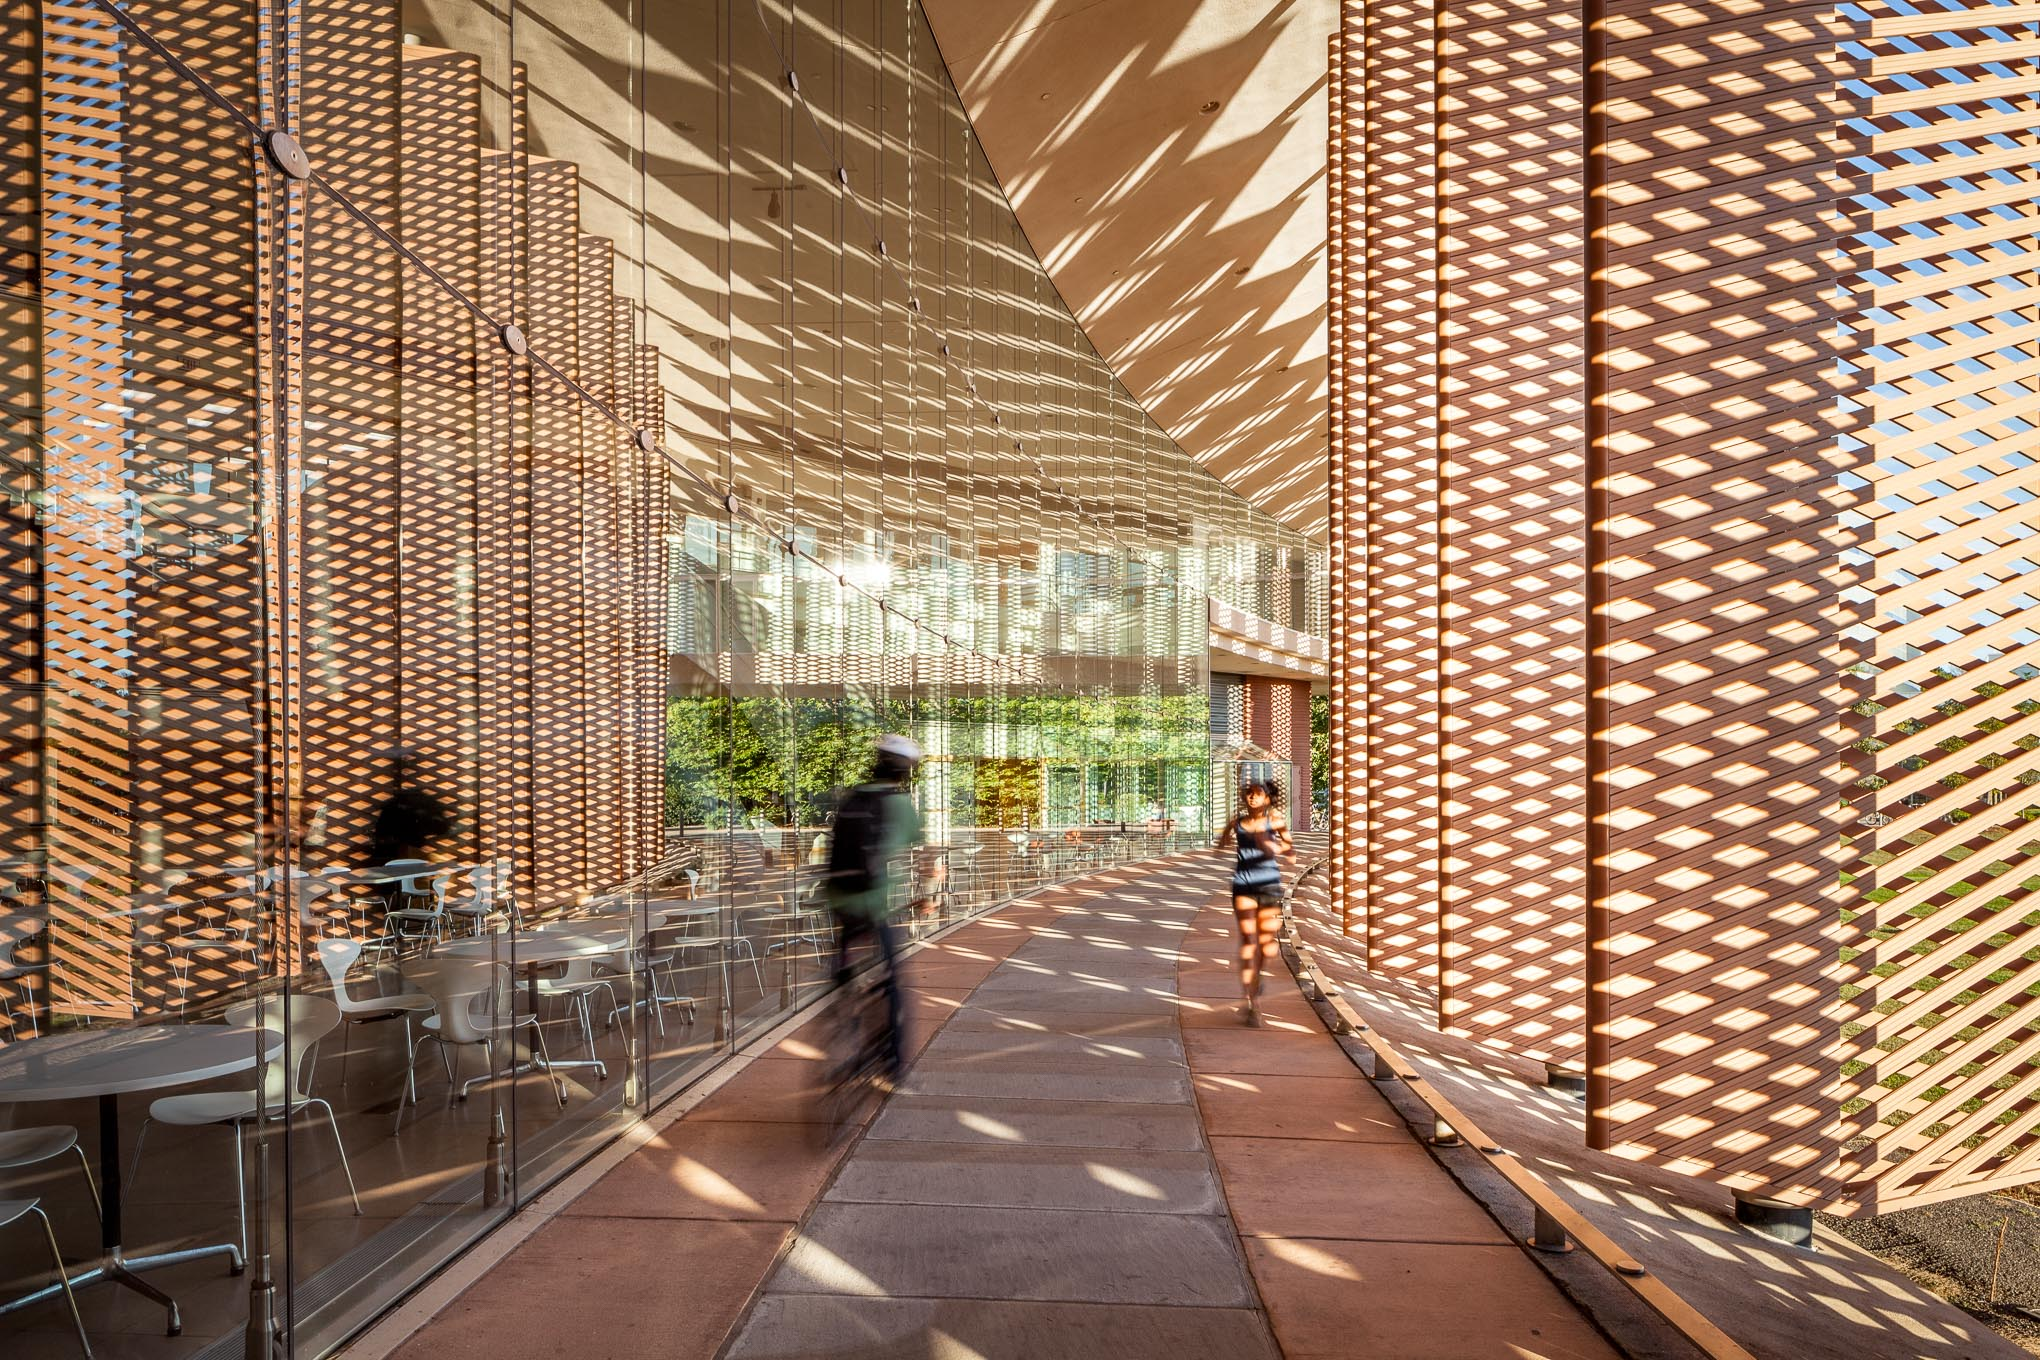 Lewis-Sigler Institute, Princeton University, Rafael Viñoly Architects